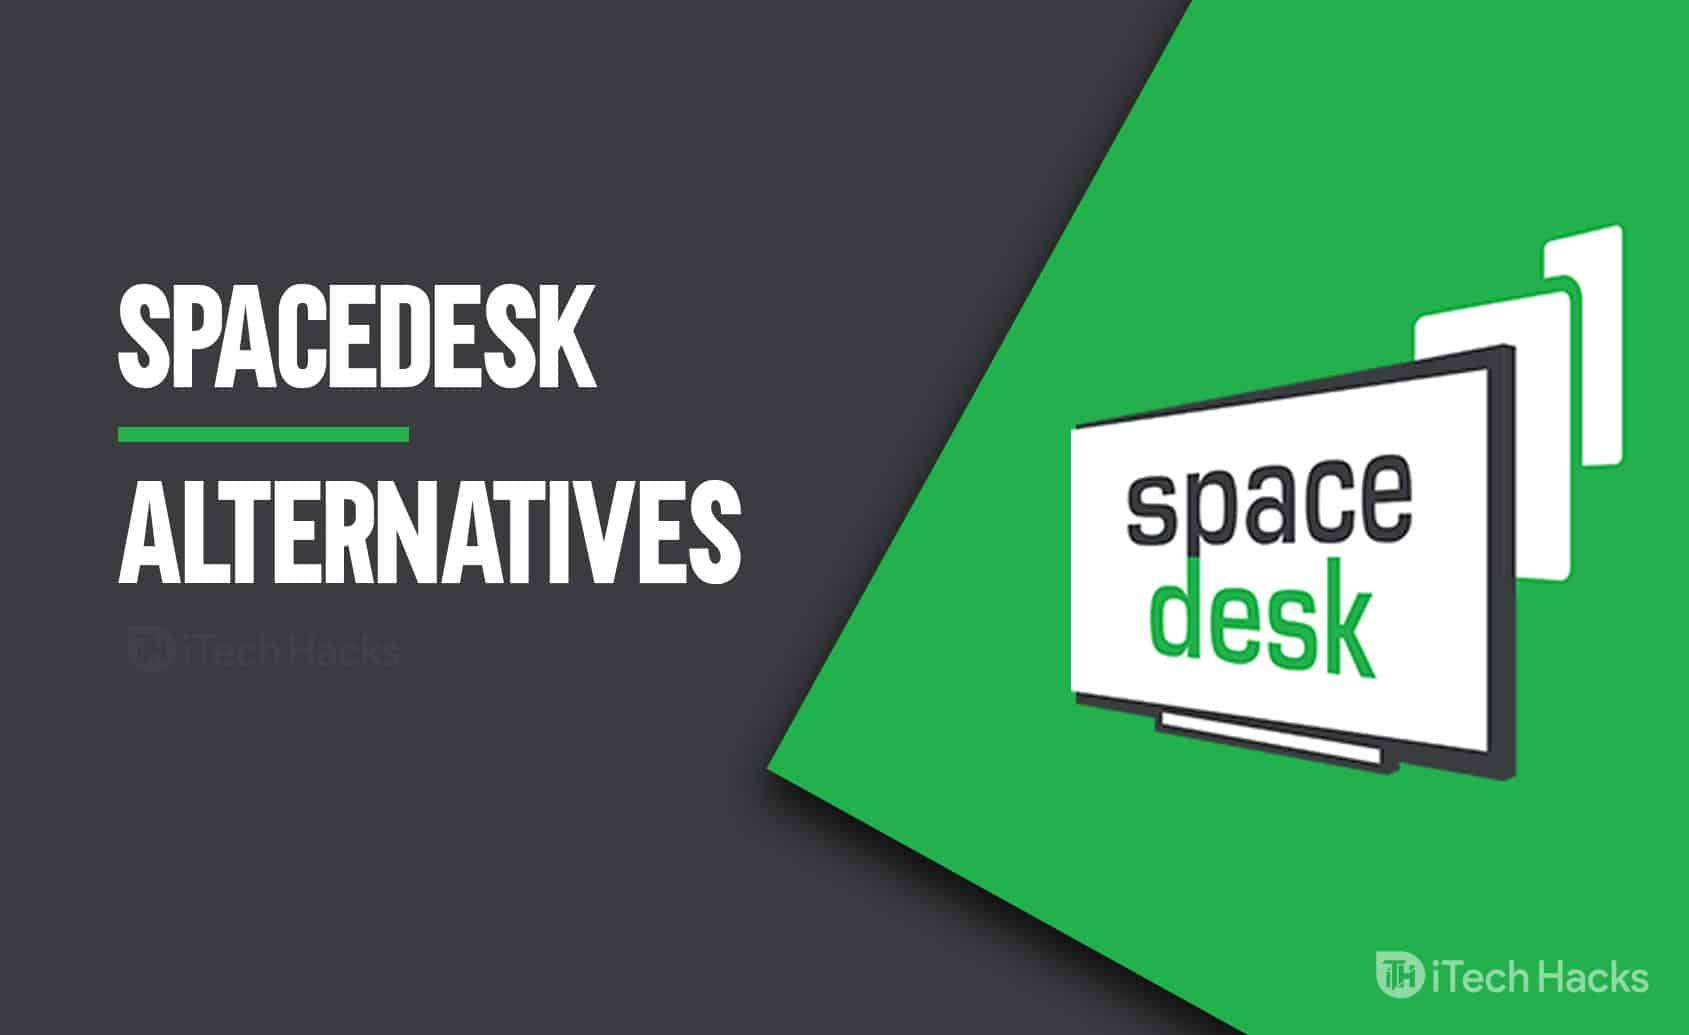 Top 6 Best Spacedesk Alternatives for Duet Display